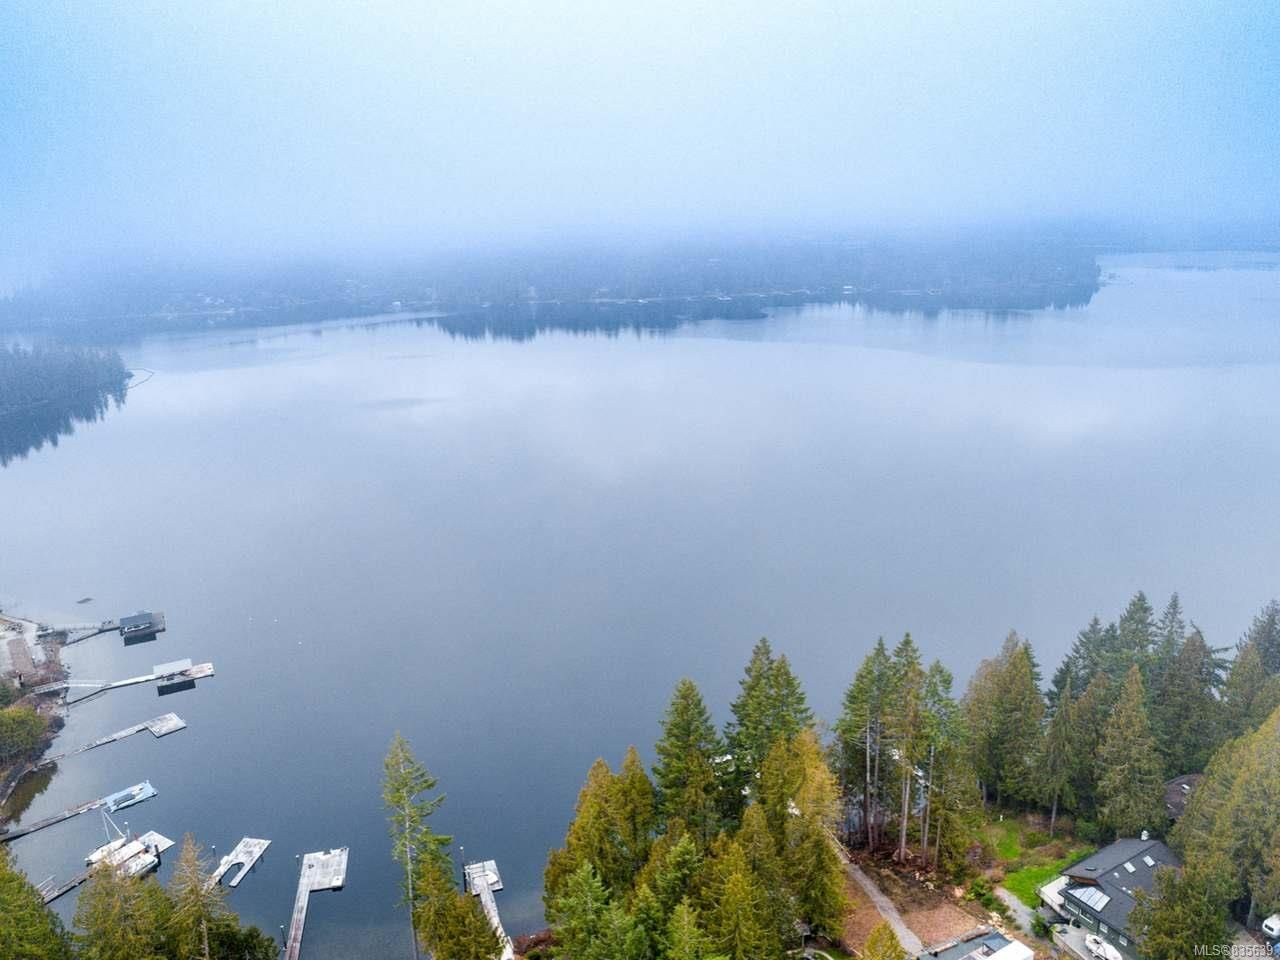 Photo 45: Photos: 9657 Faber Rd in PORT ALBERNI: PA Sproat Lake House for sale (Port Alberni)  : MLS®# 835639